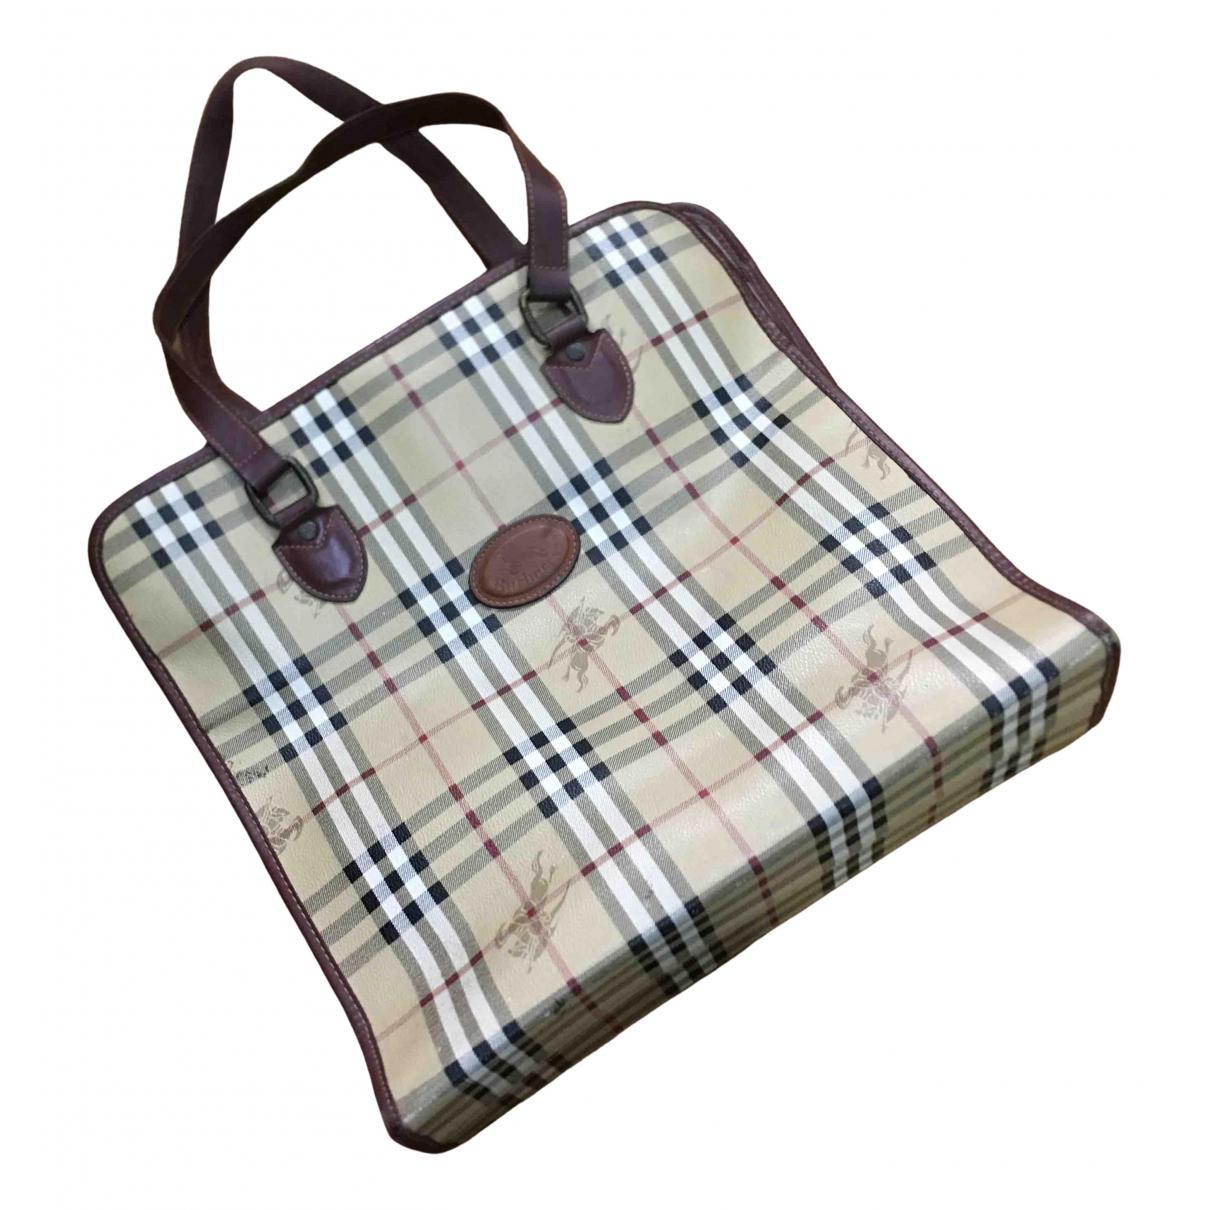 Burberry N Brown Leather bag for Men N